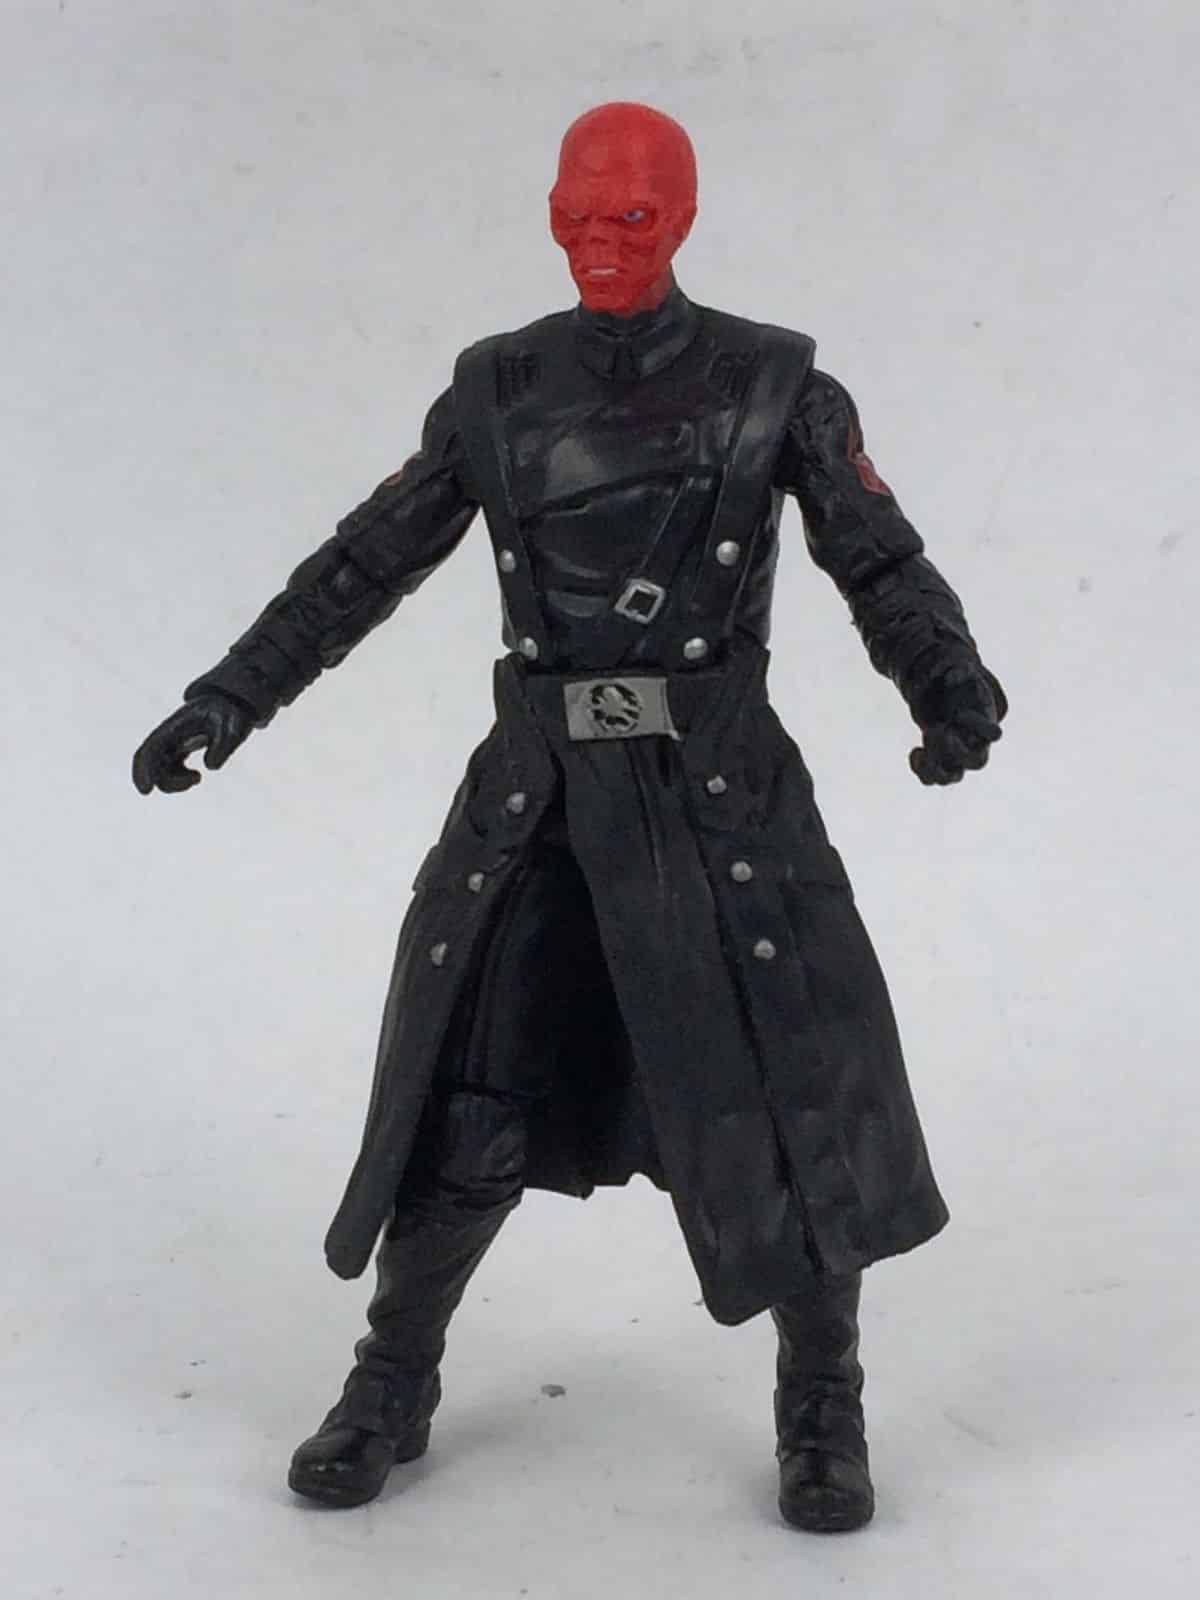 Captain-America-Winter-Soldier-Red-Skull-Figure